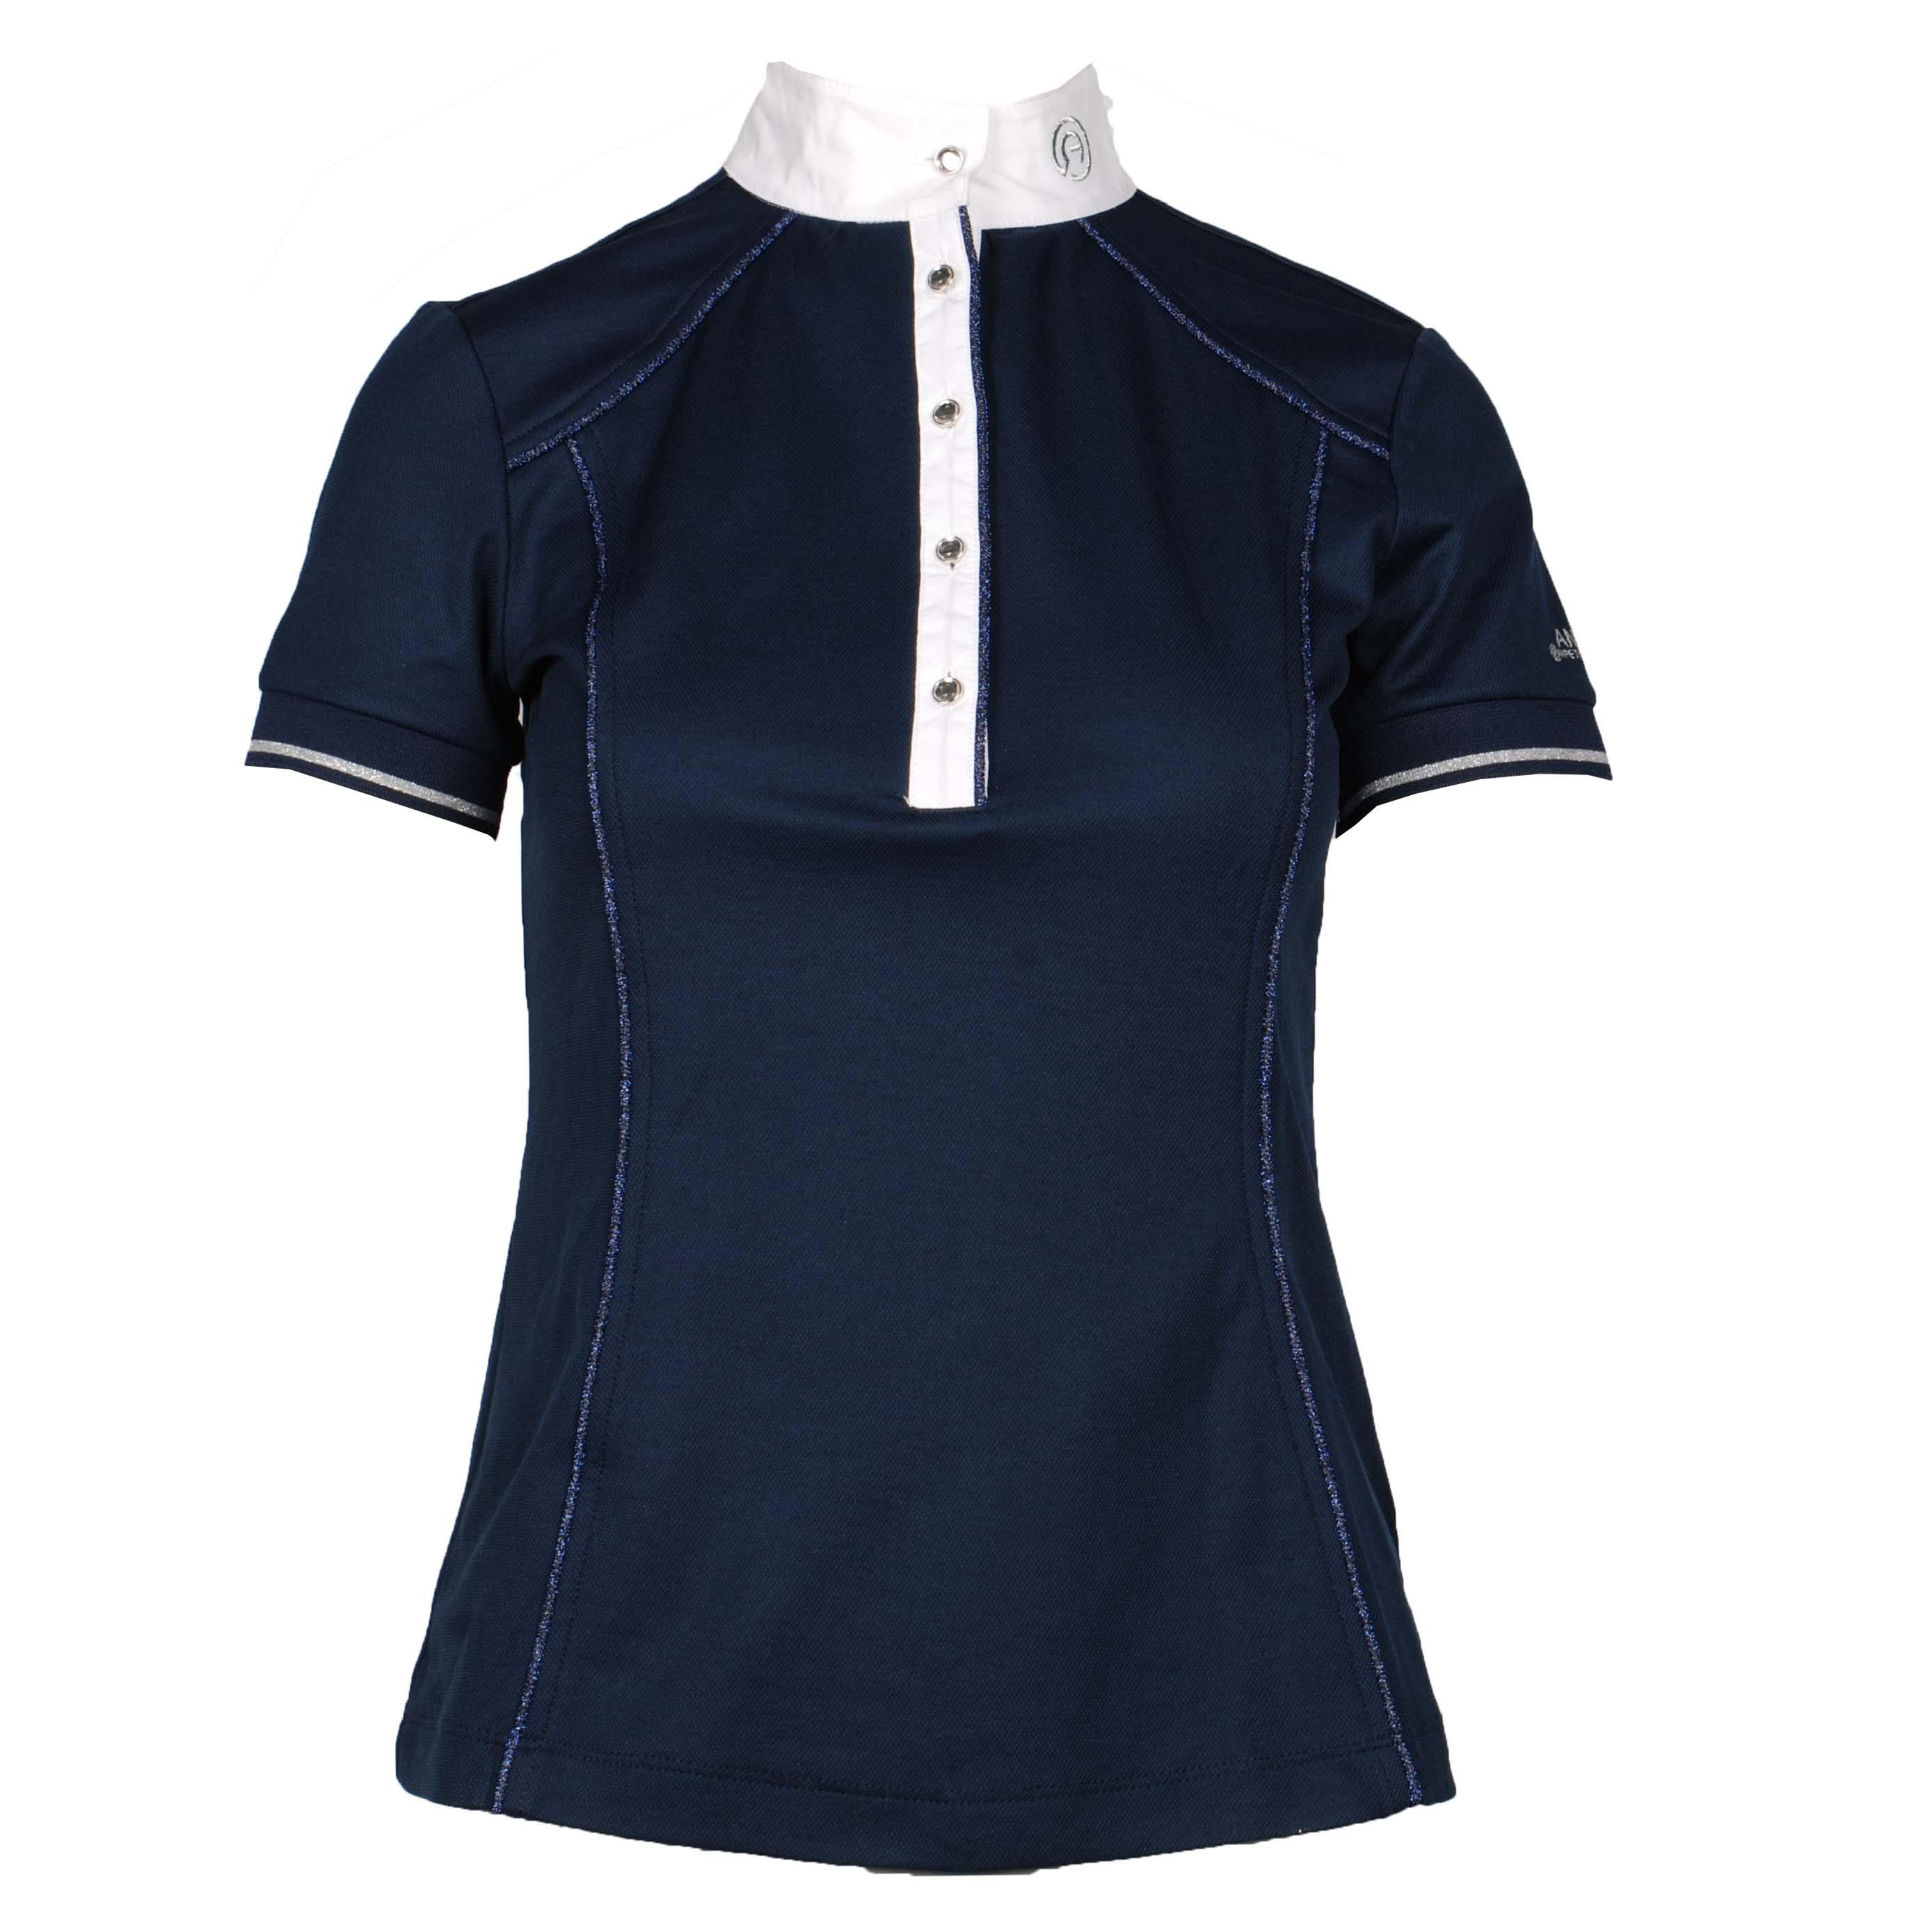 Anky Subtle donkerblauw wedstrijdshirt donkerblauw maat:s